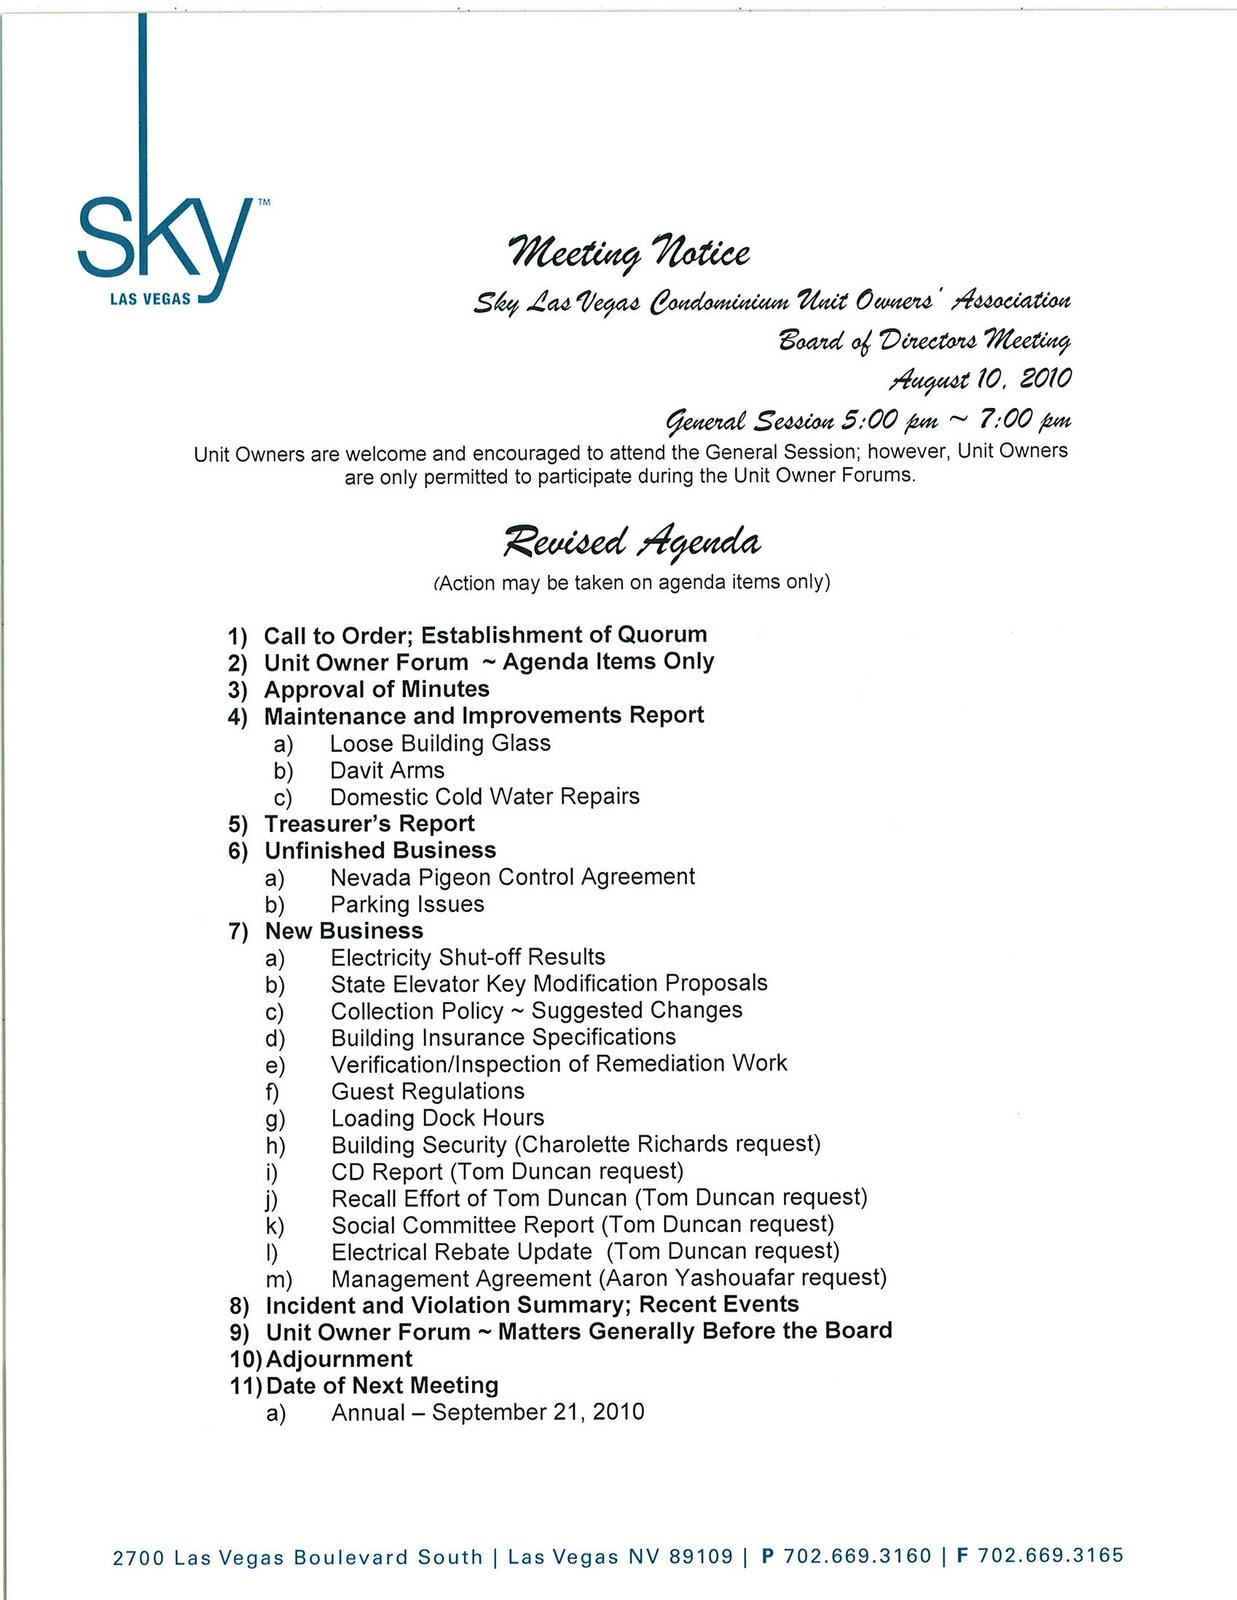 welcome to sky las vegas at skylasvegas info and the